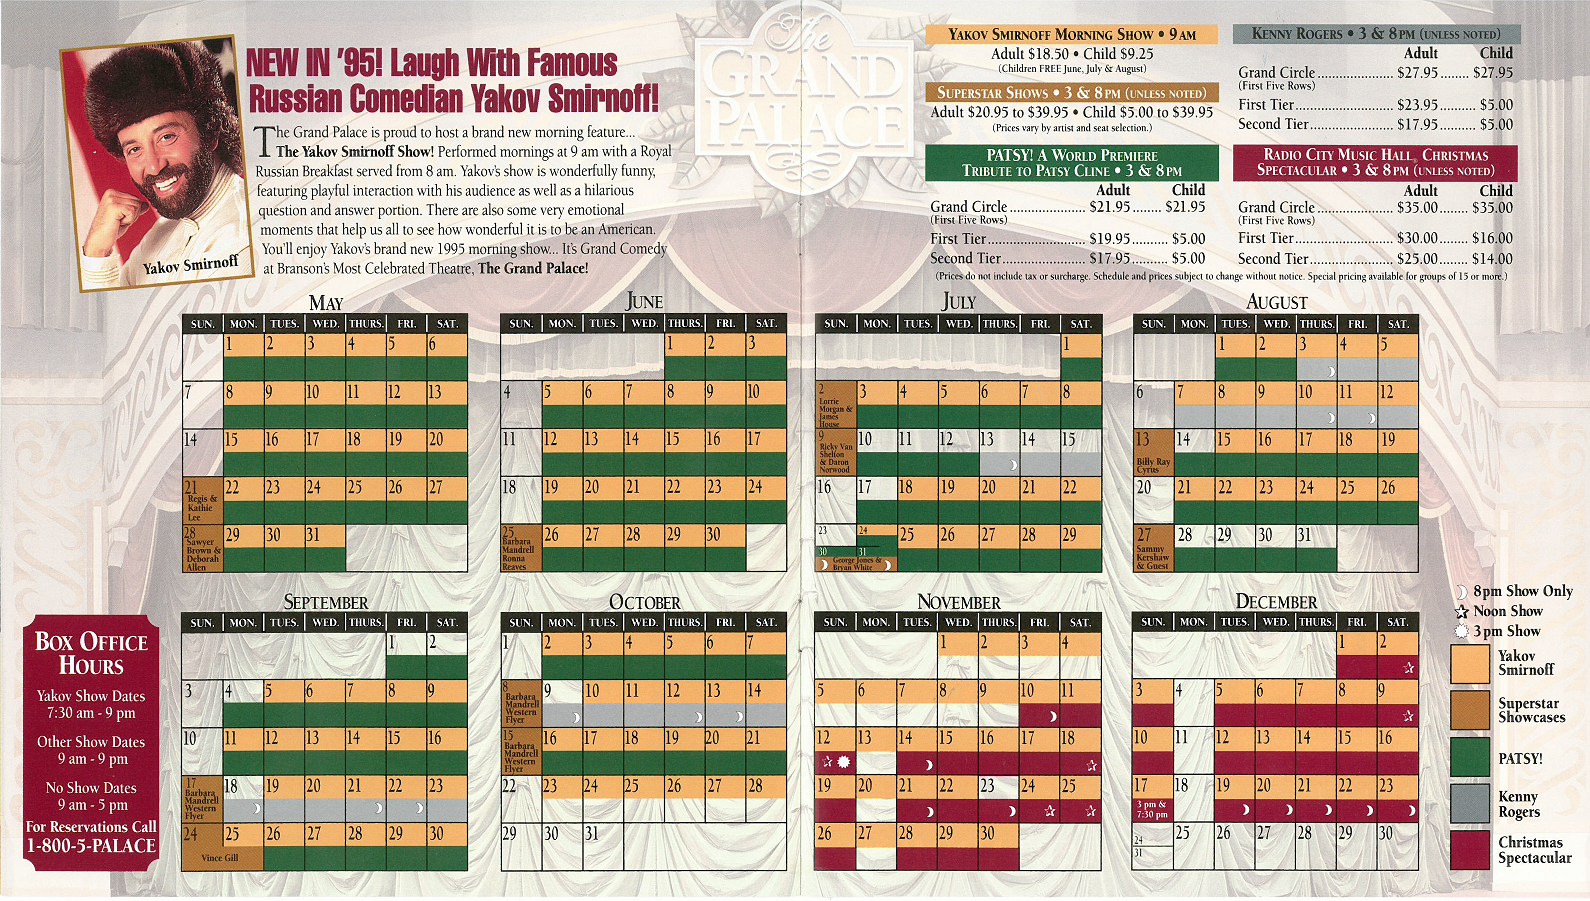 The 1995 Grand Palace Theatre brochure. Branson, Missouri